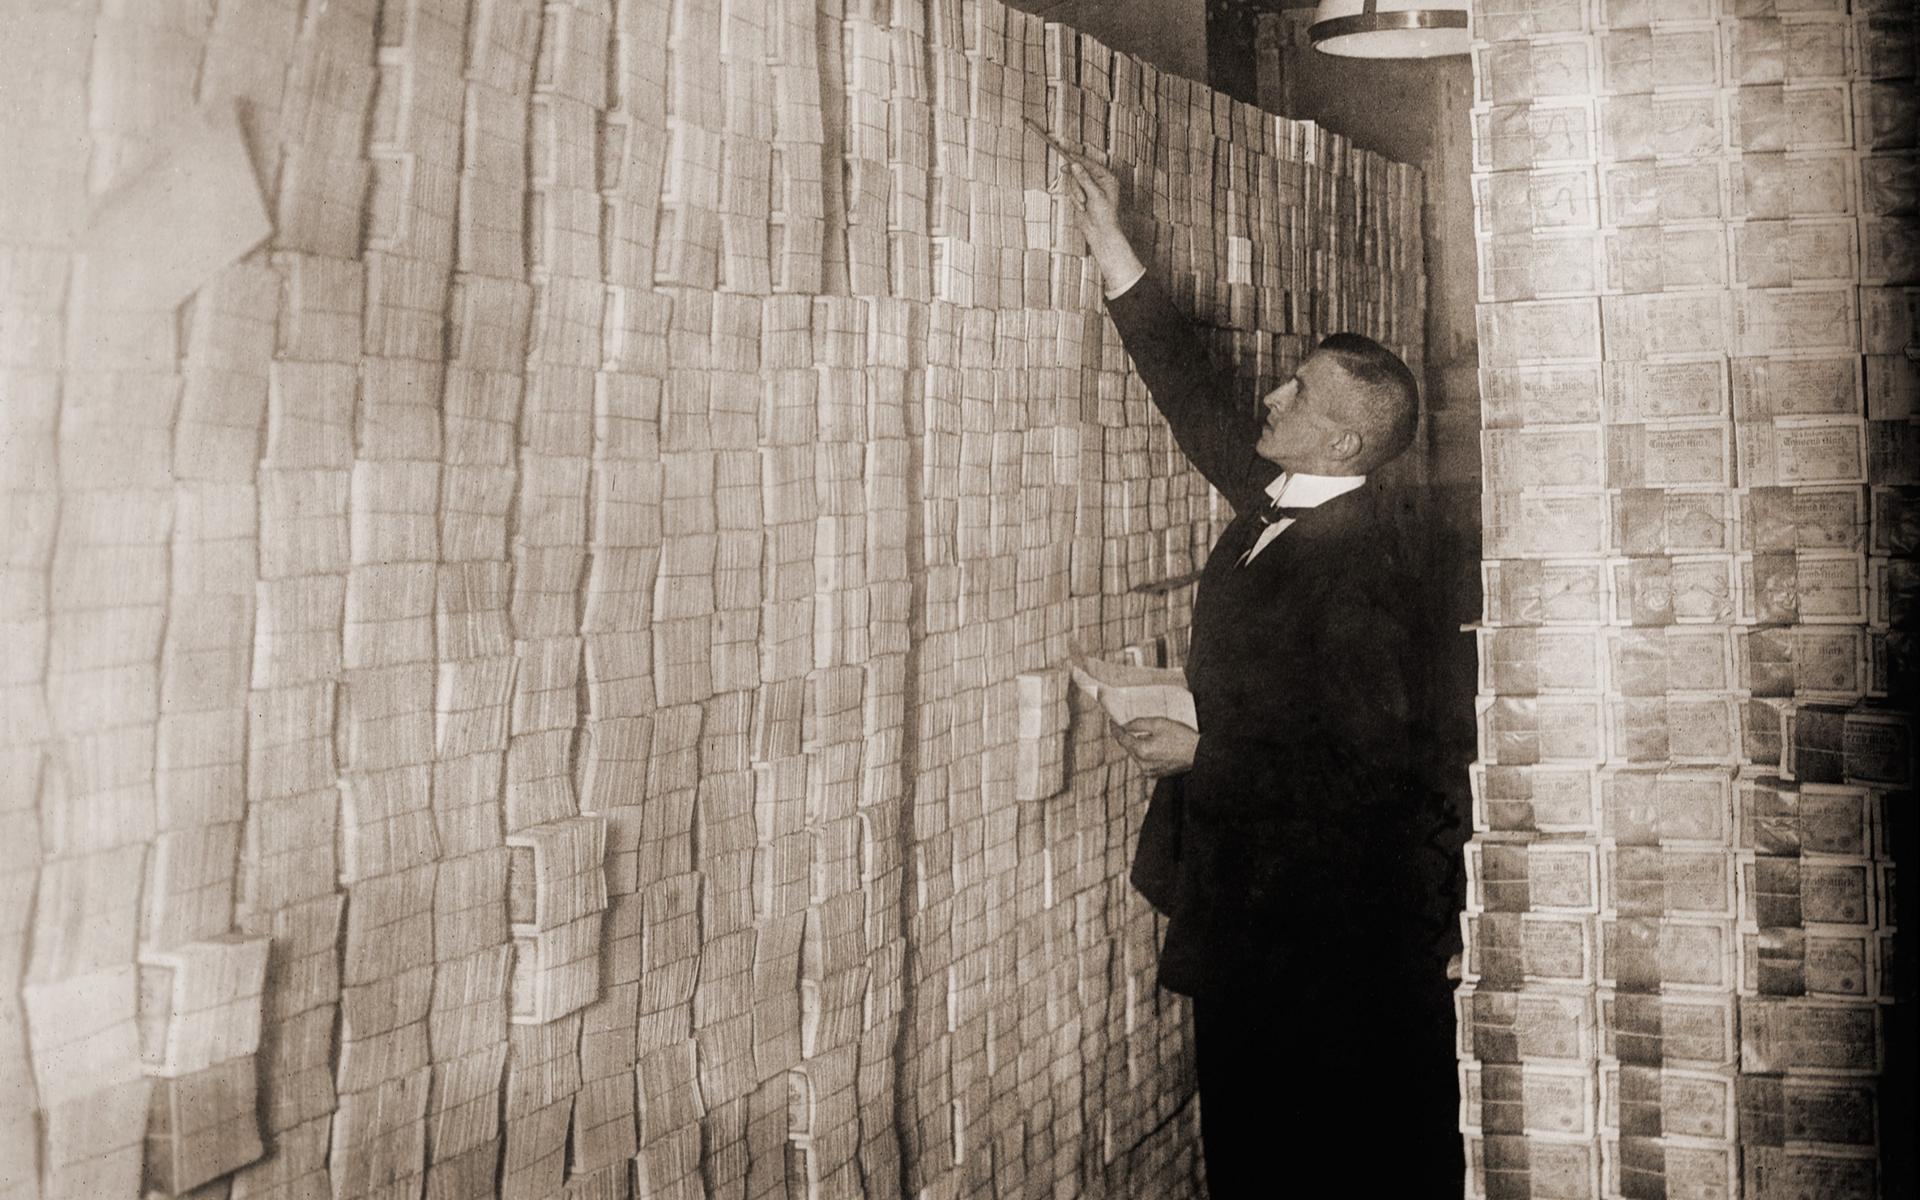 weimar republic hyperinflation us dollar bitcoin